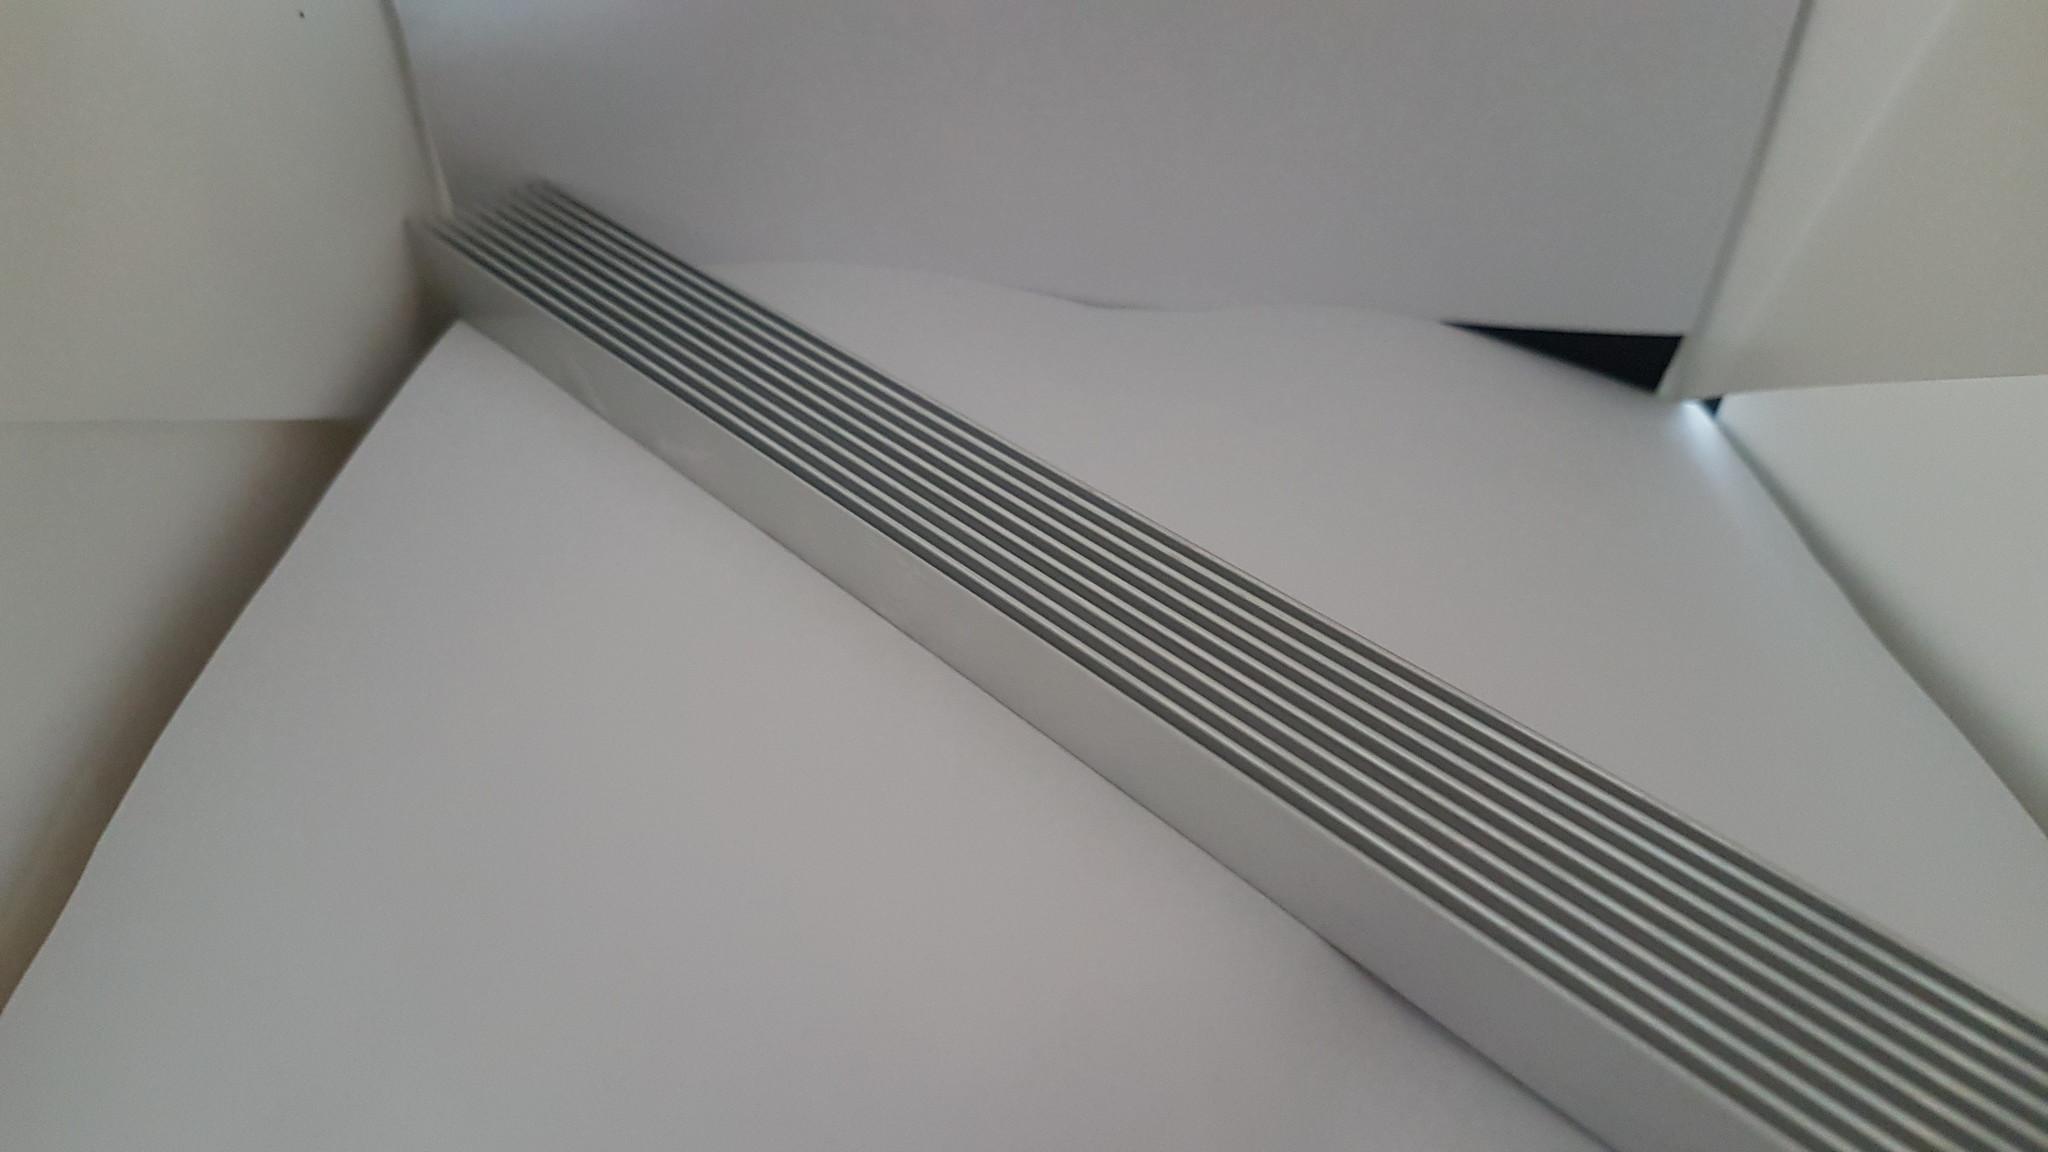 Aluminum heat sink (heatsink) 300 x 25 x 12mm